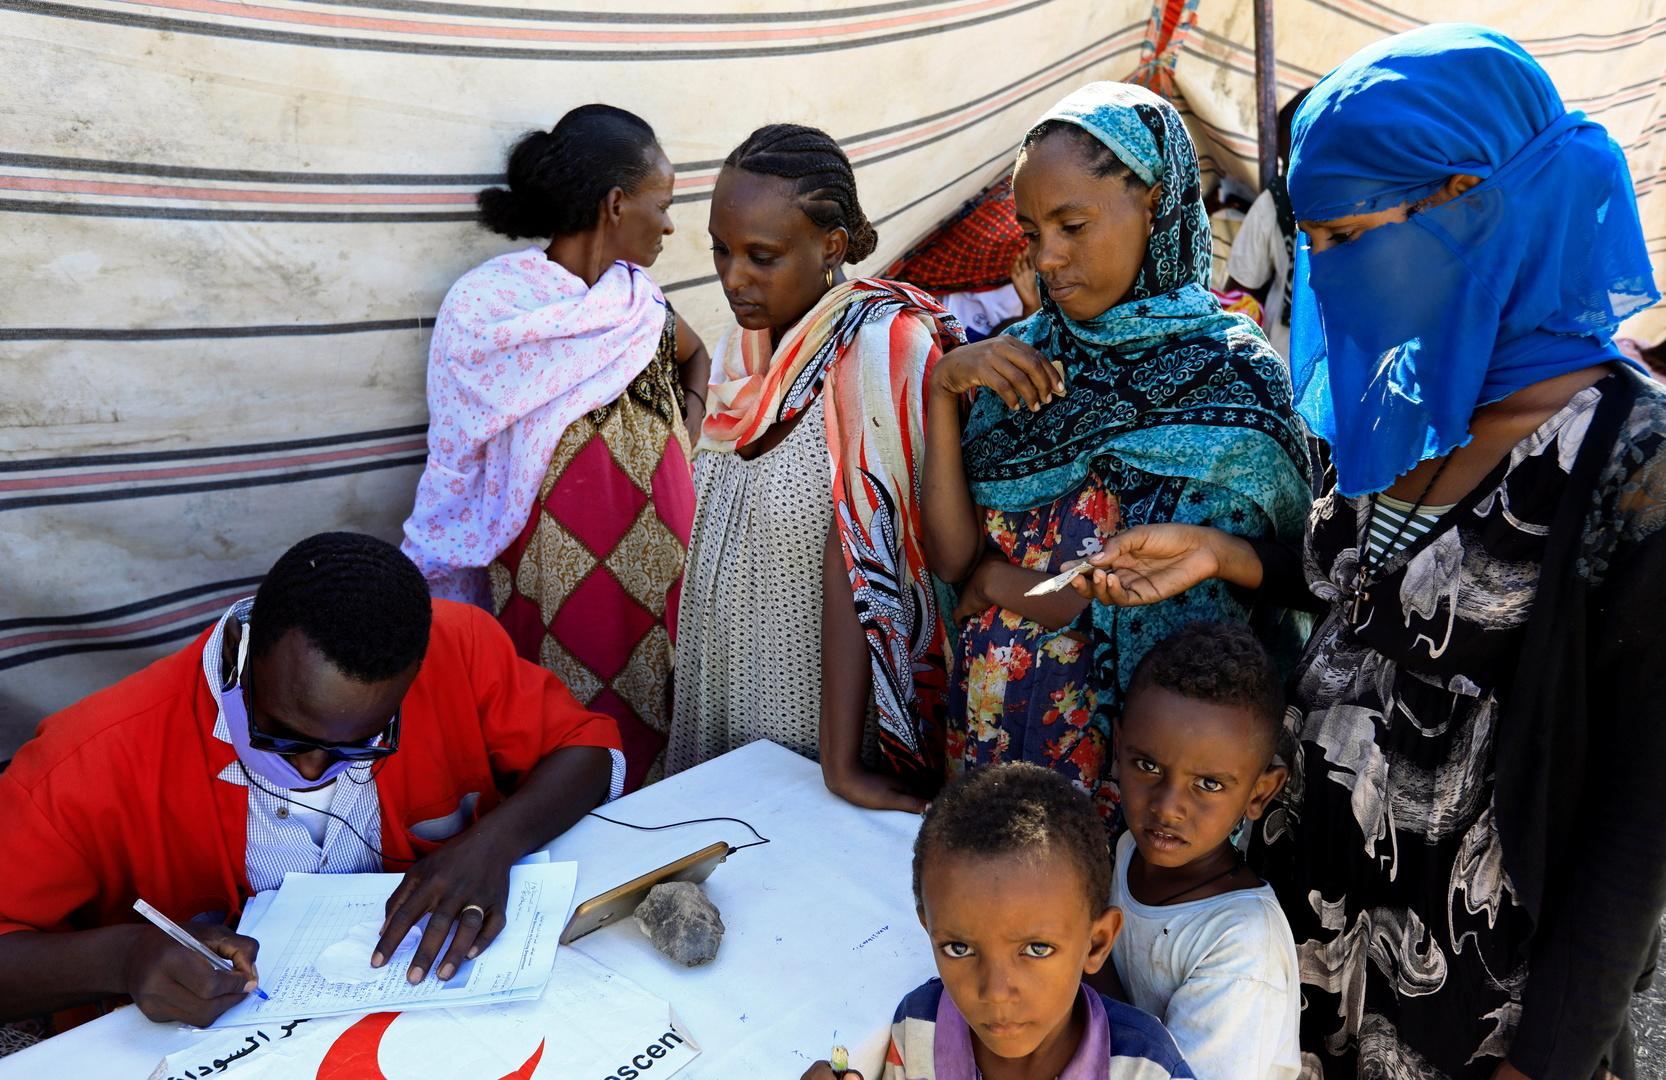 لاجئون إثيوبيون في السودان، أرشيف